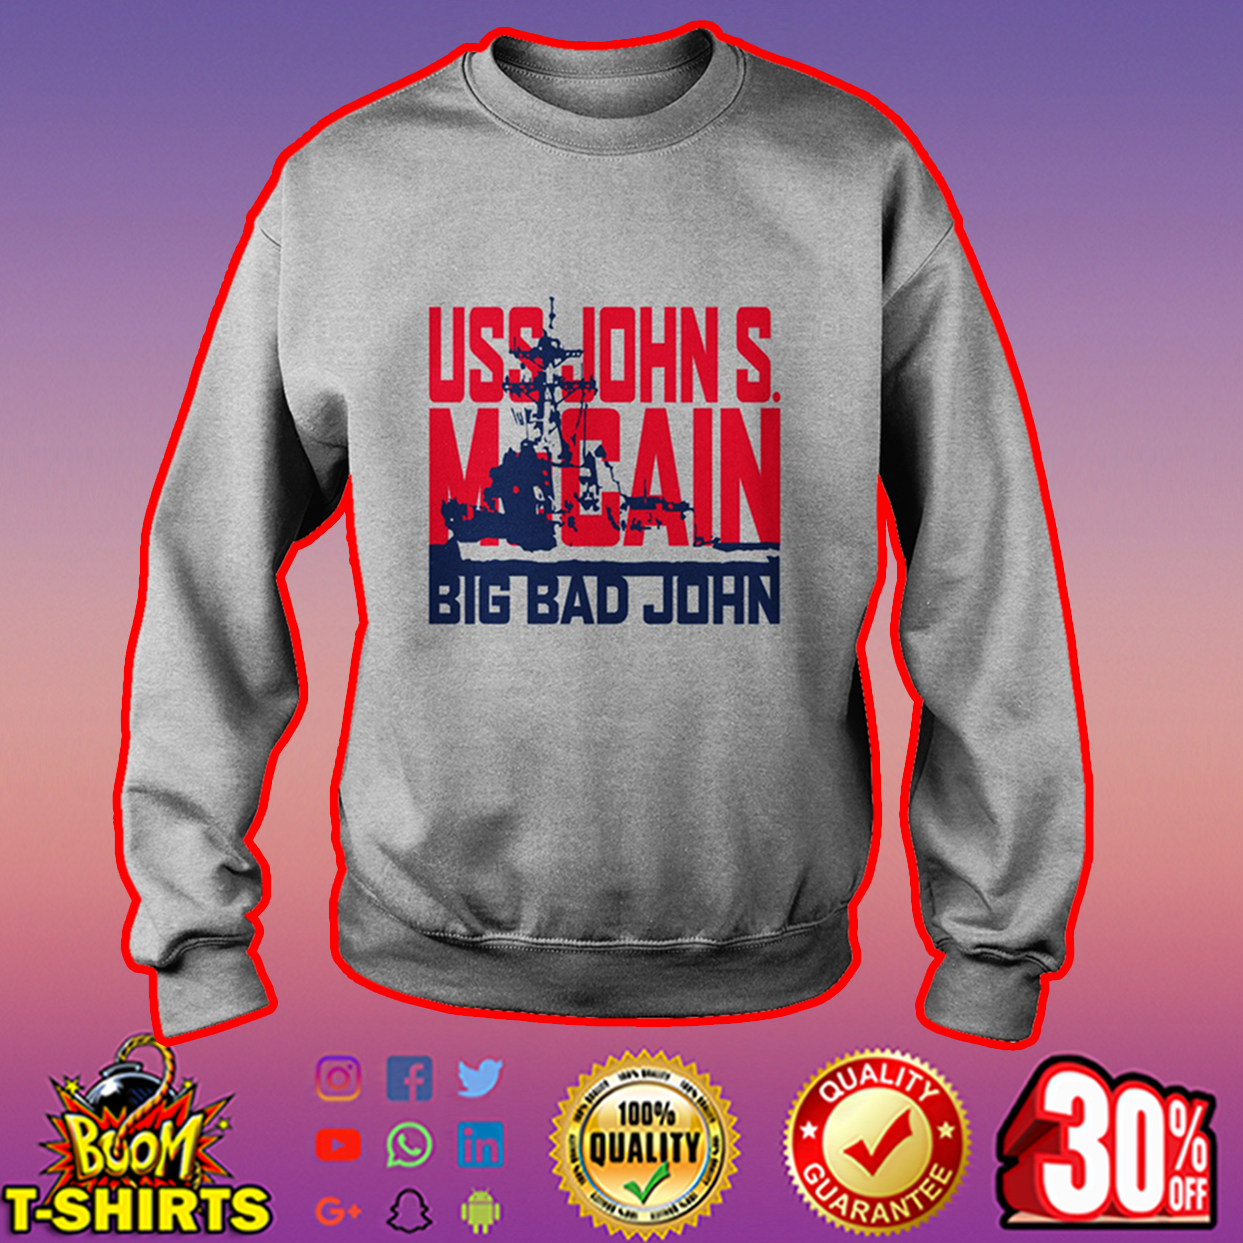 USS John S. McCain Big Bad John sweatshirt